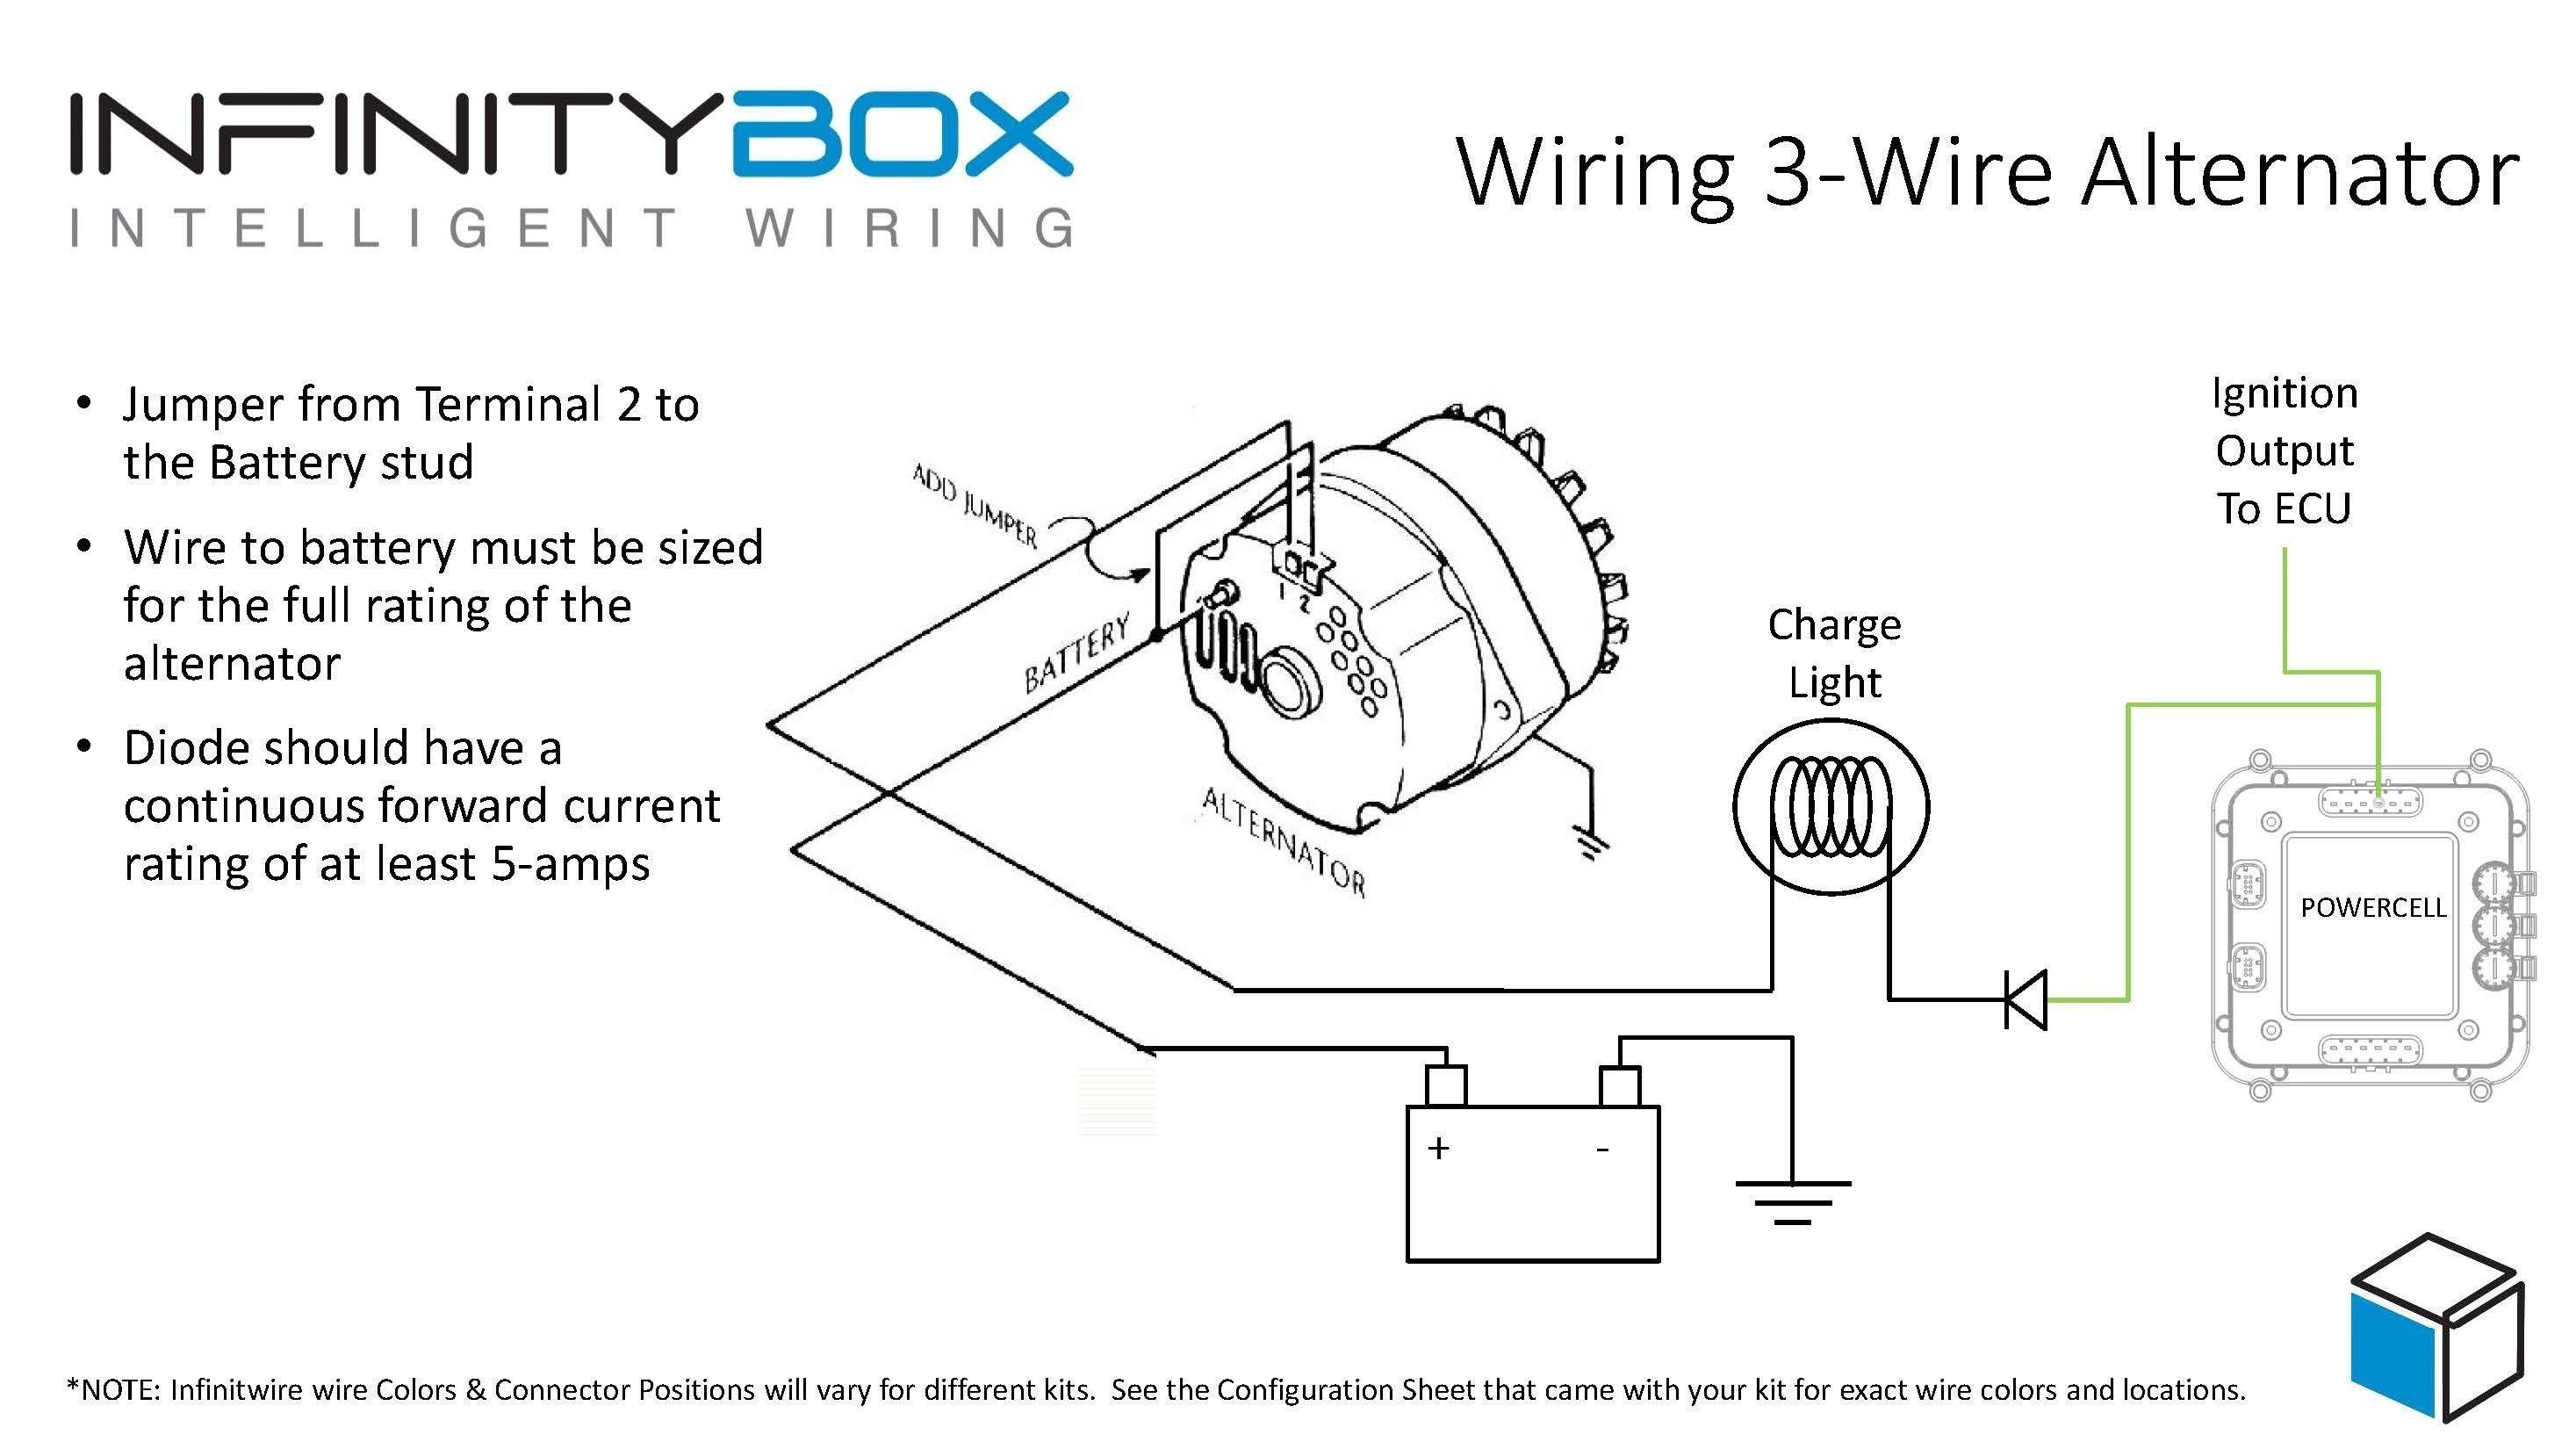 Unique Skytronics Alternator Wiring Diagram diagrams